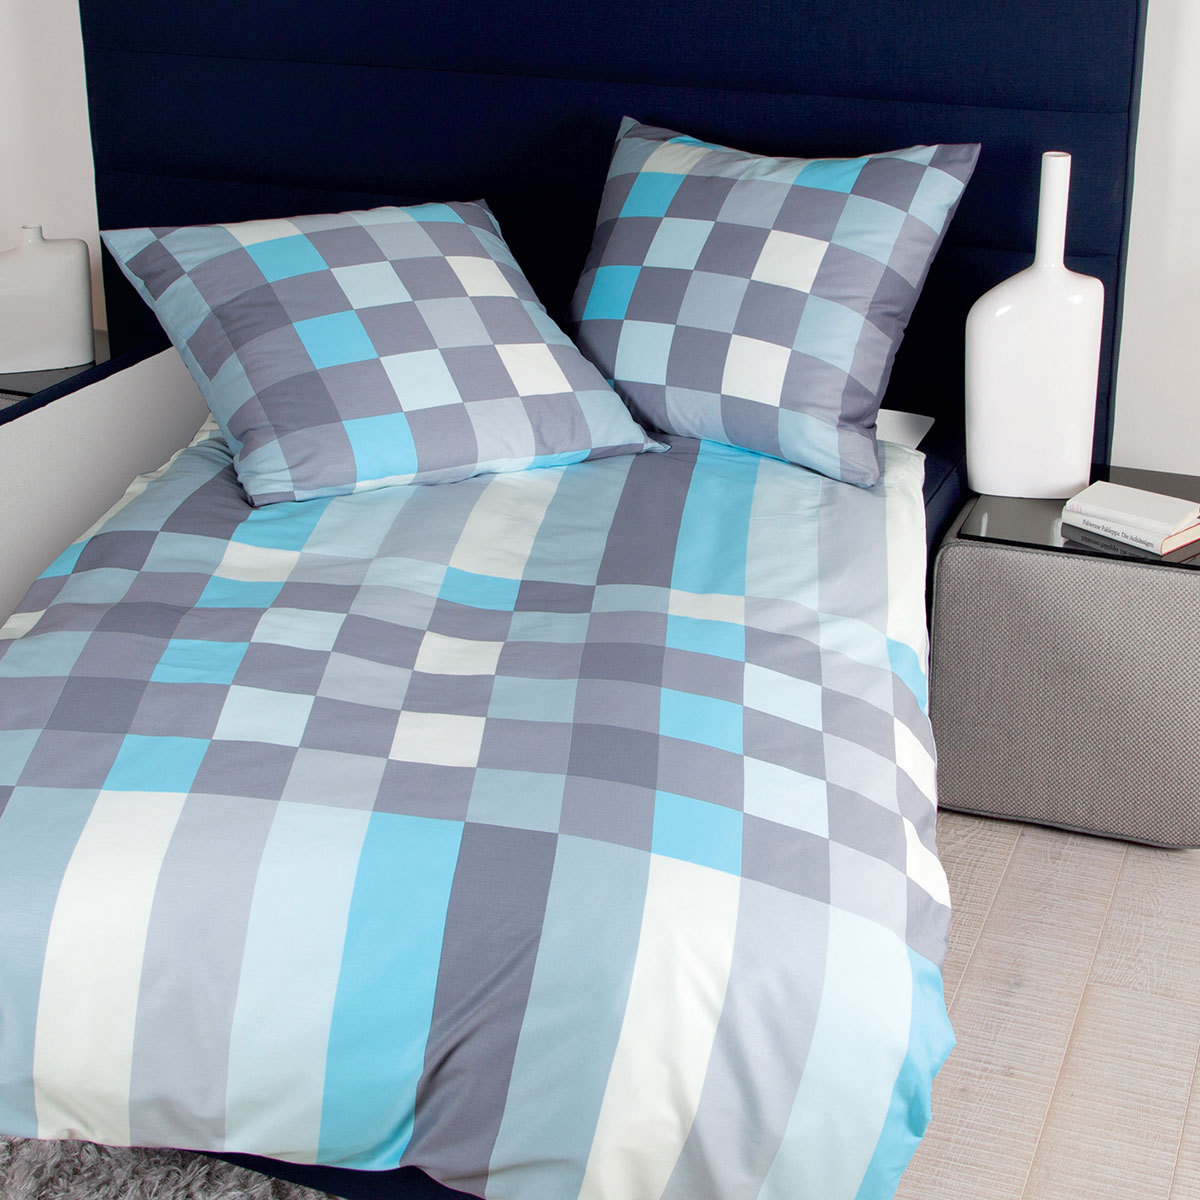 janine mako satin bettw sche j d 8476 08 g nstig online kaufen bei bettwaren shop. Black Bedroom Furniture Sets. Home Design Ideas